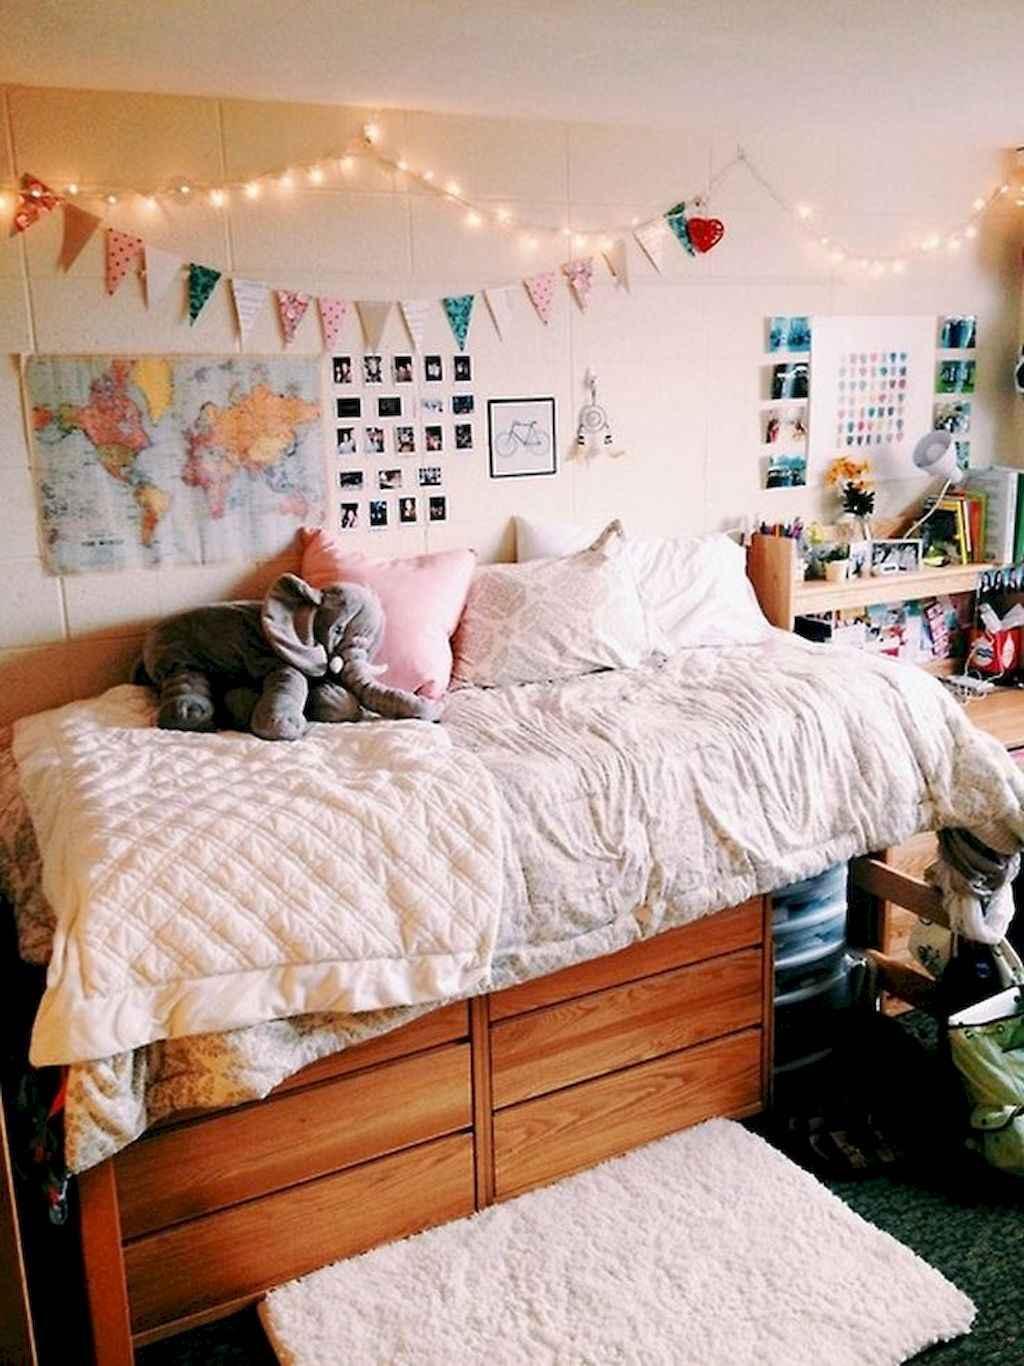 Cute diy dorm room decorating ideas on a budget (29)